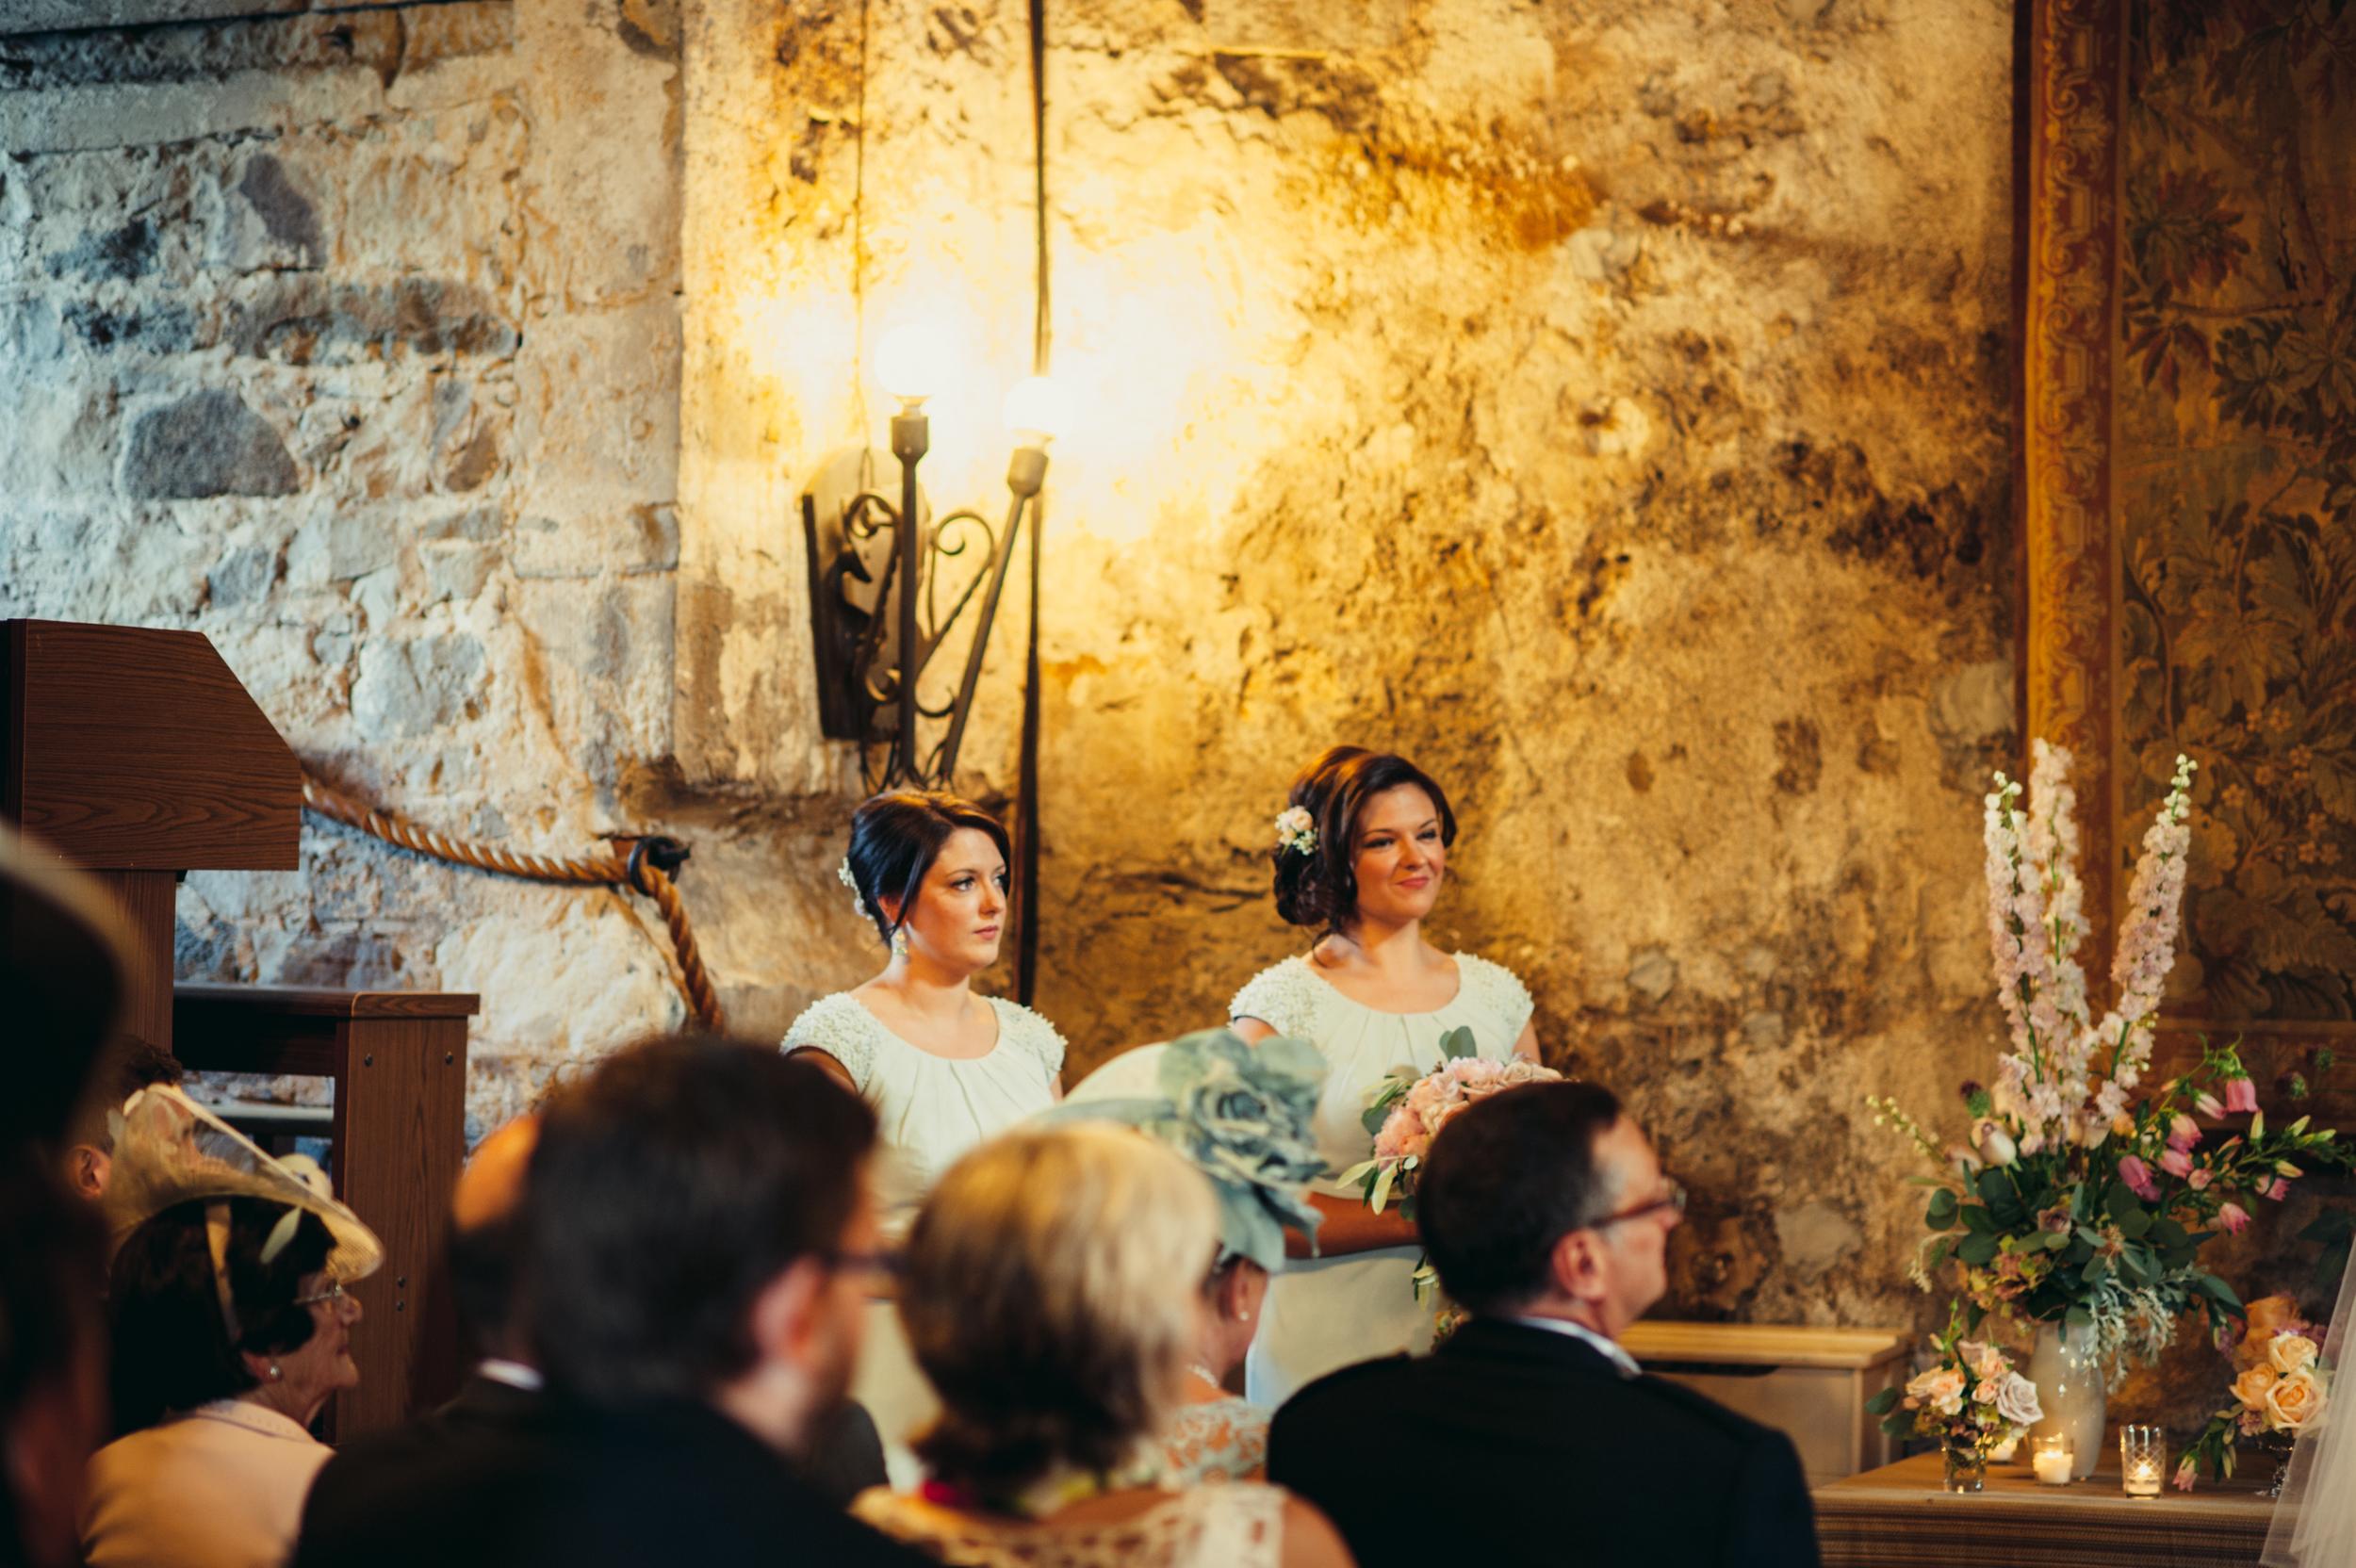 0104-lisa-devine-alternative-creative-wedding-photography-glasgow-edinburgh.JPG